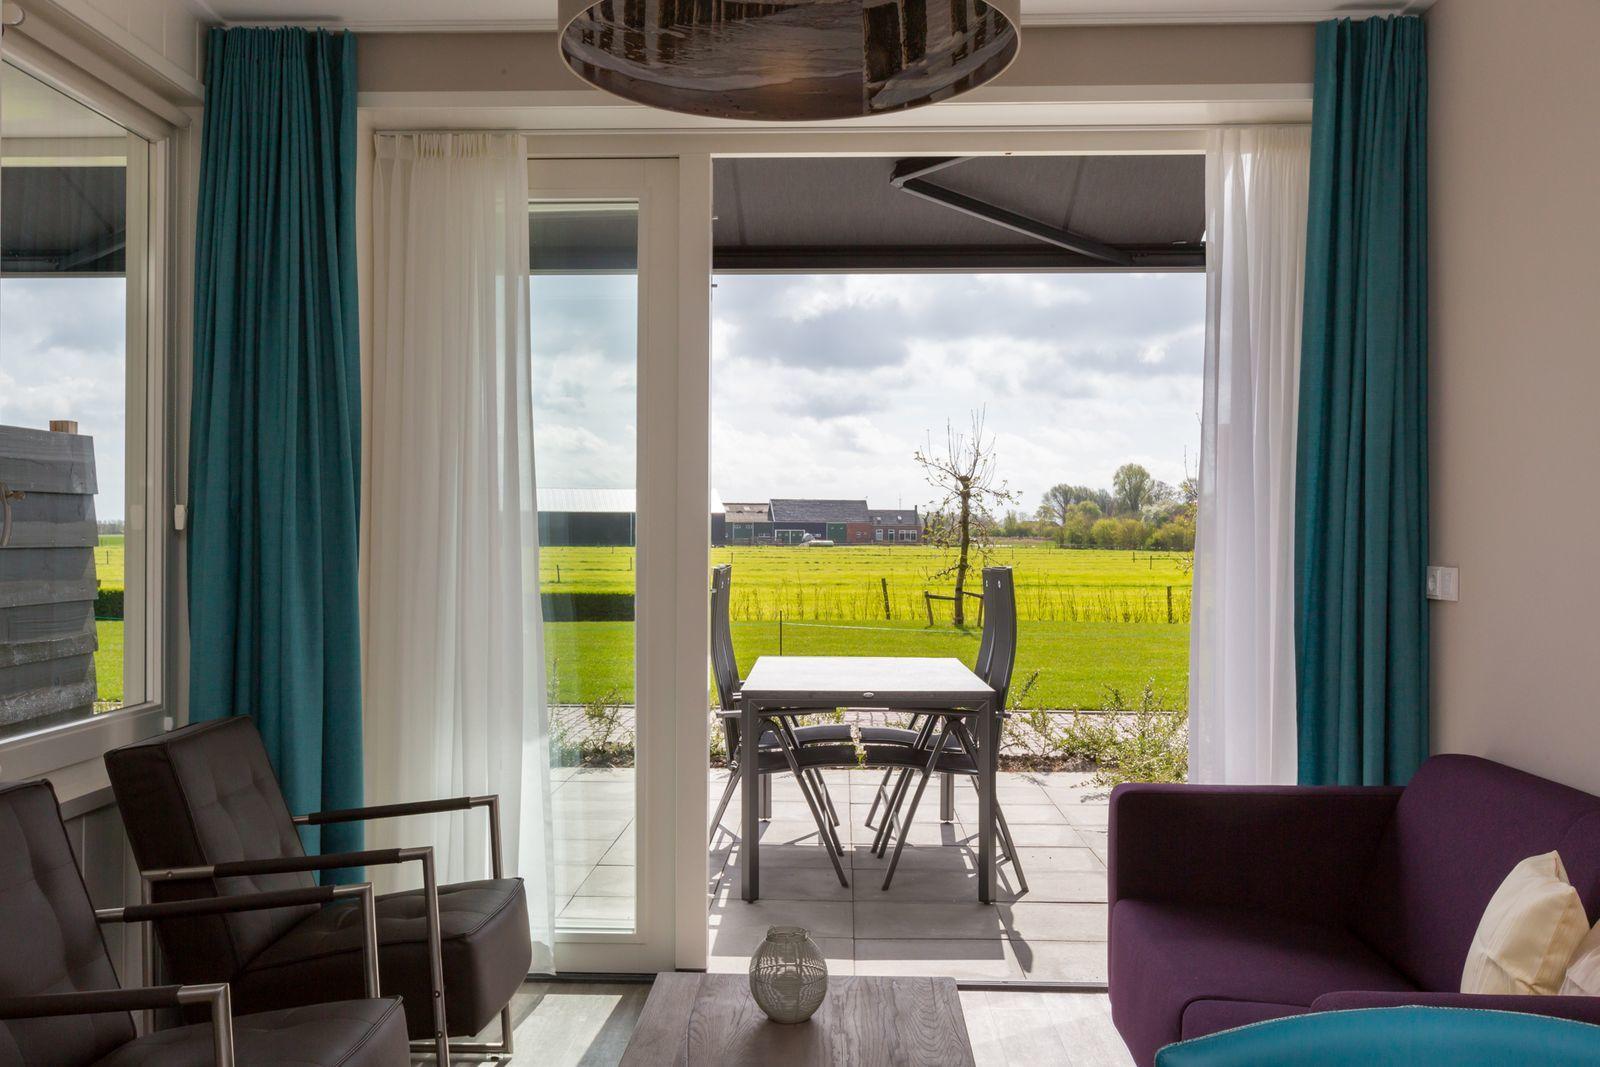 "Ferienwohnung  - Noordweg 56a | Oostkapelle ""Comfort 4* personen"""